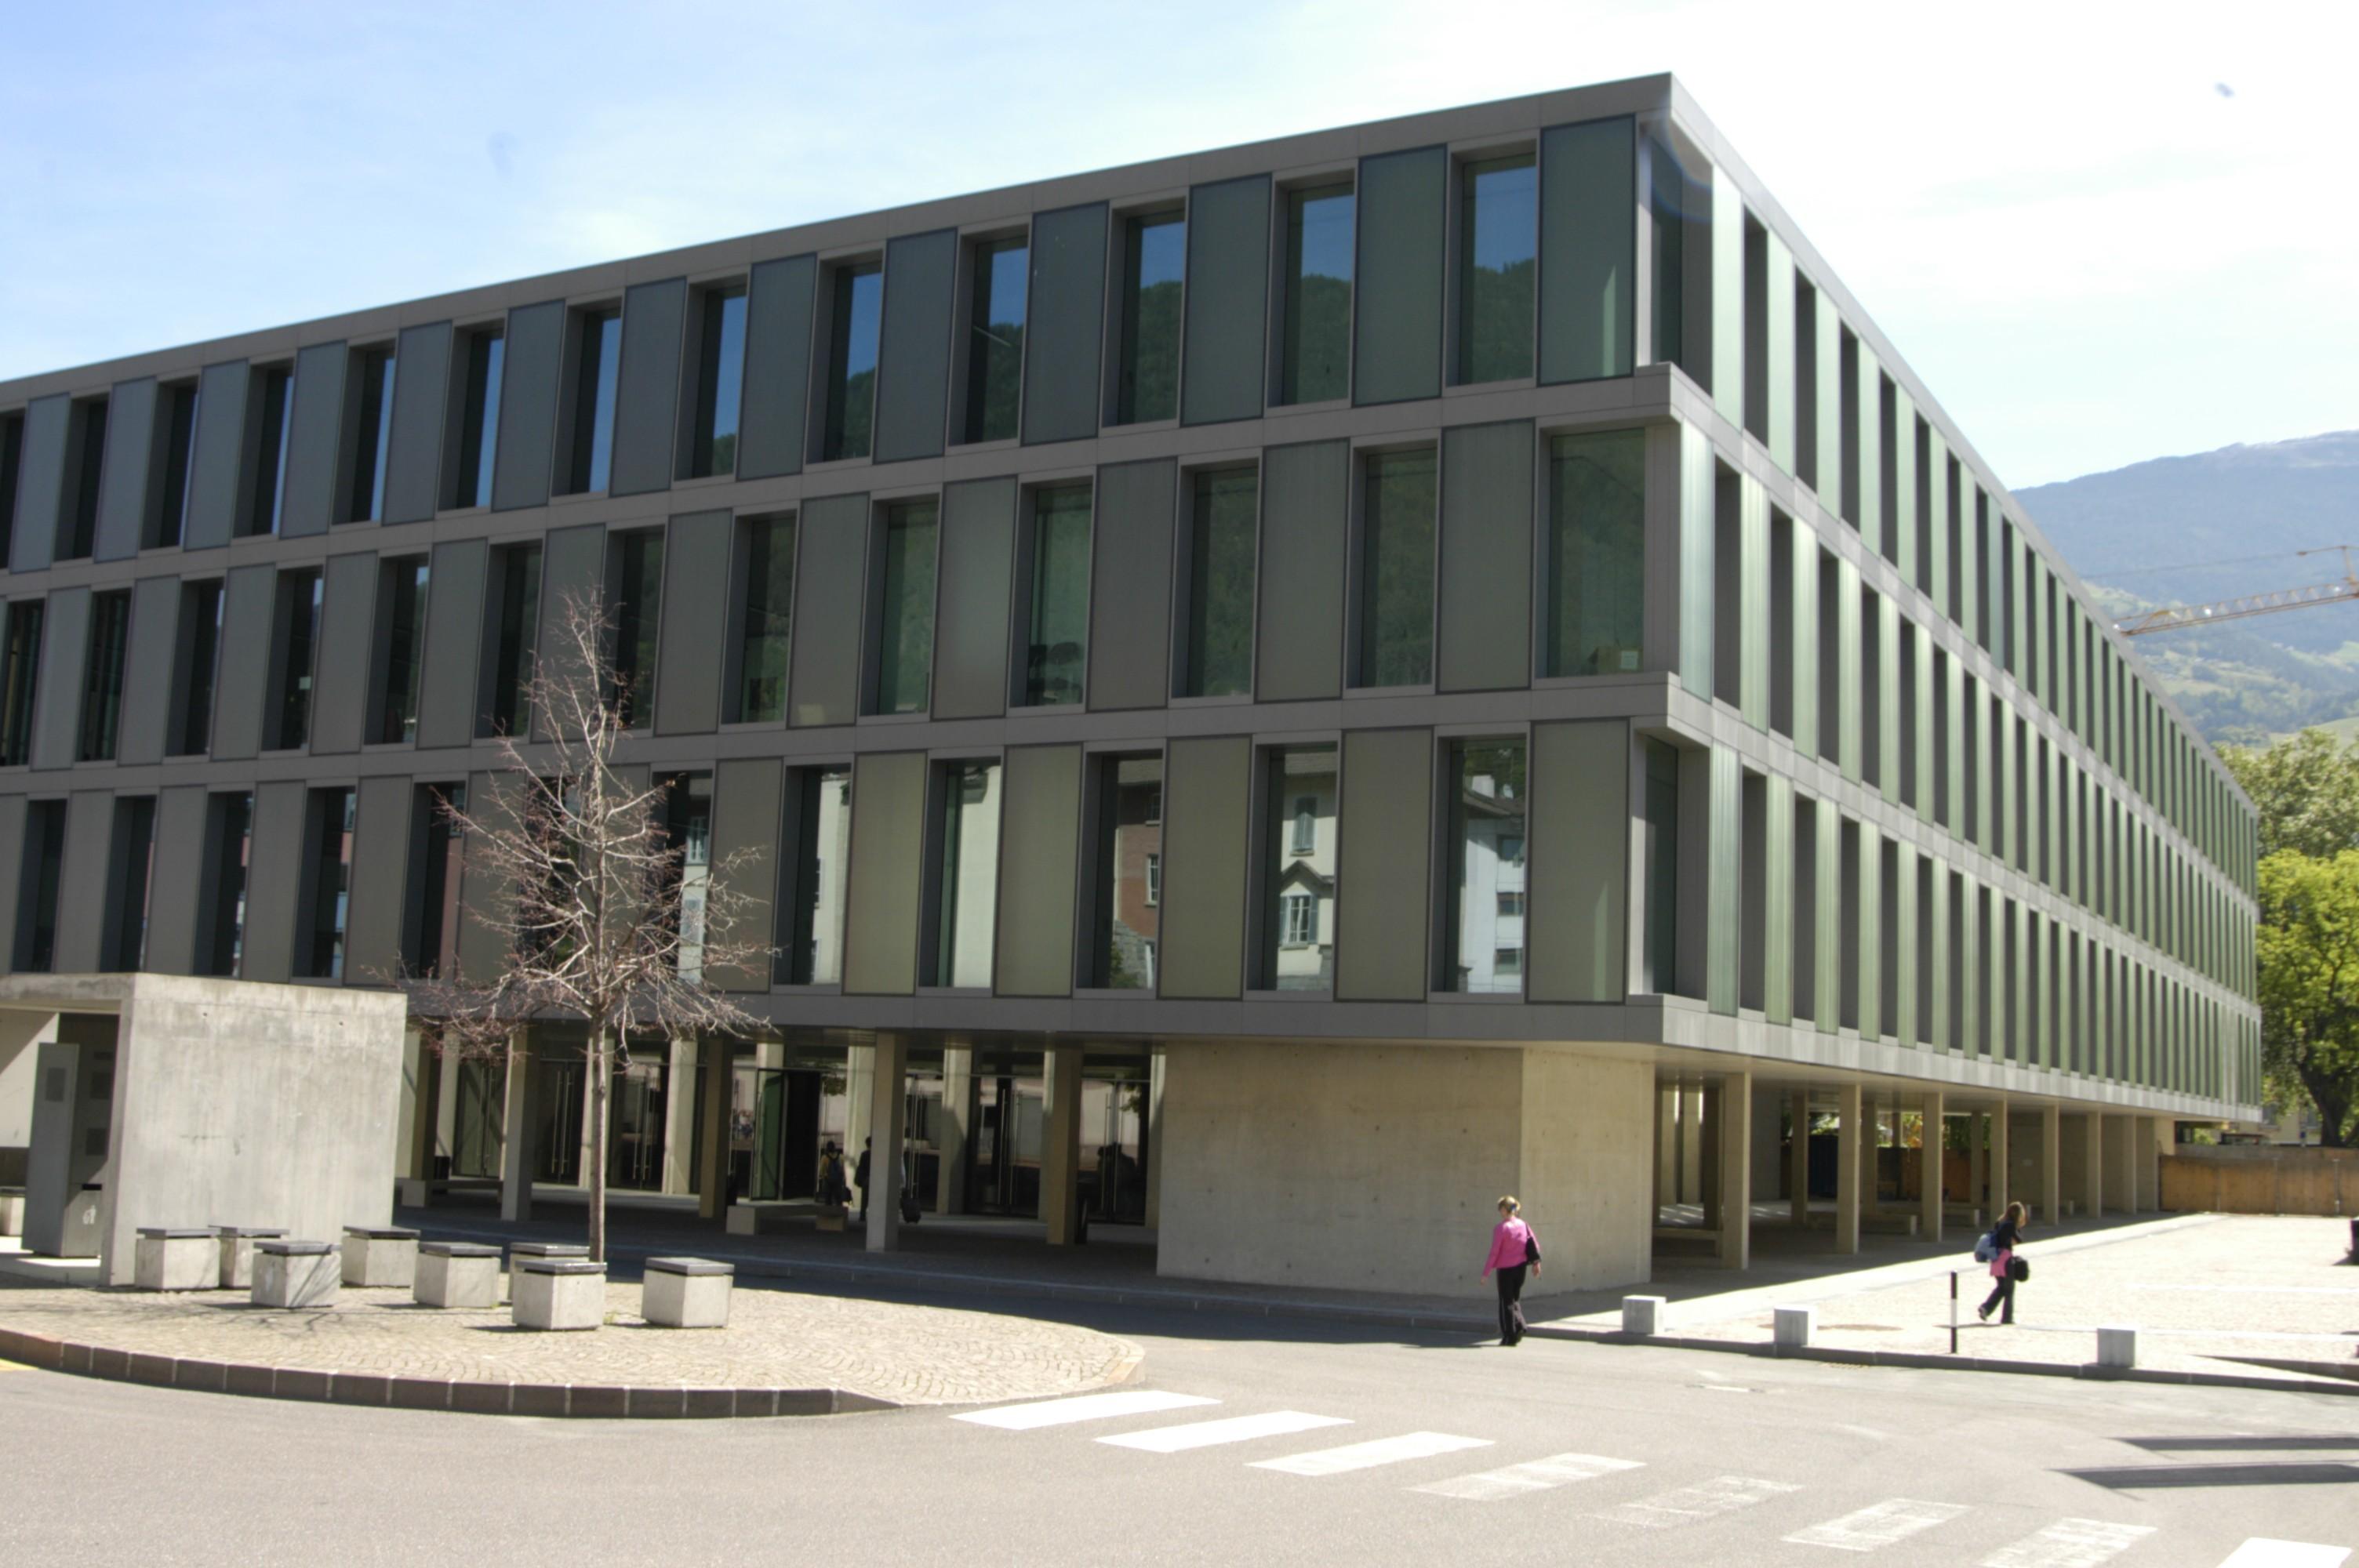 Arredo: Bolzano industriale